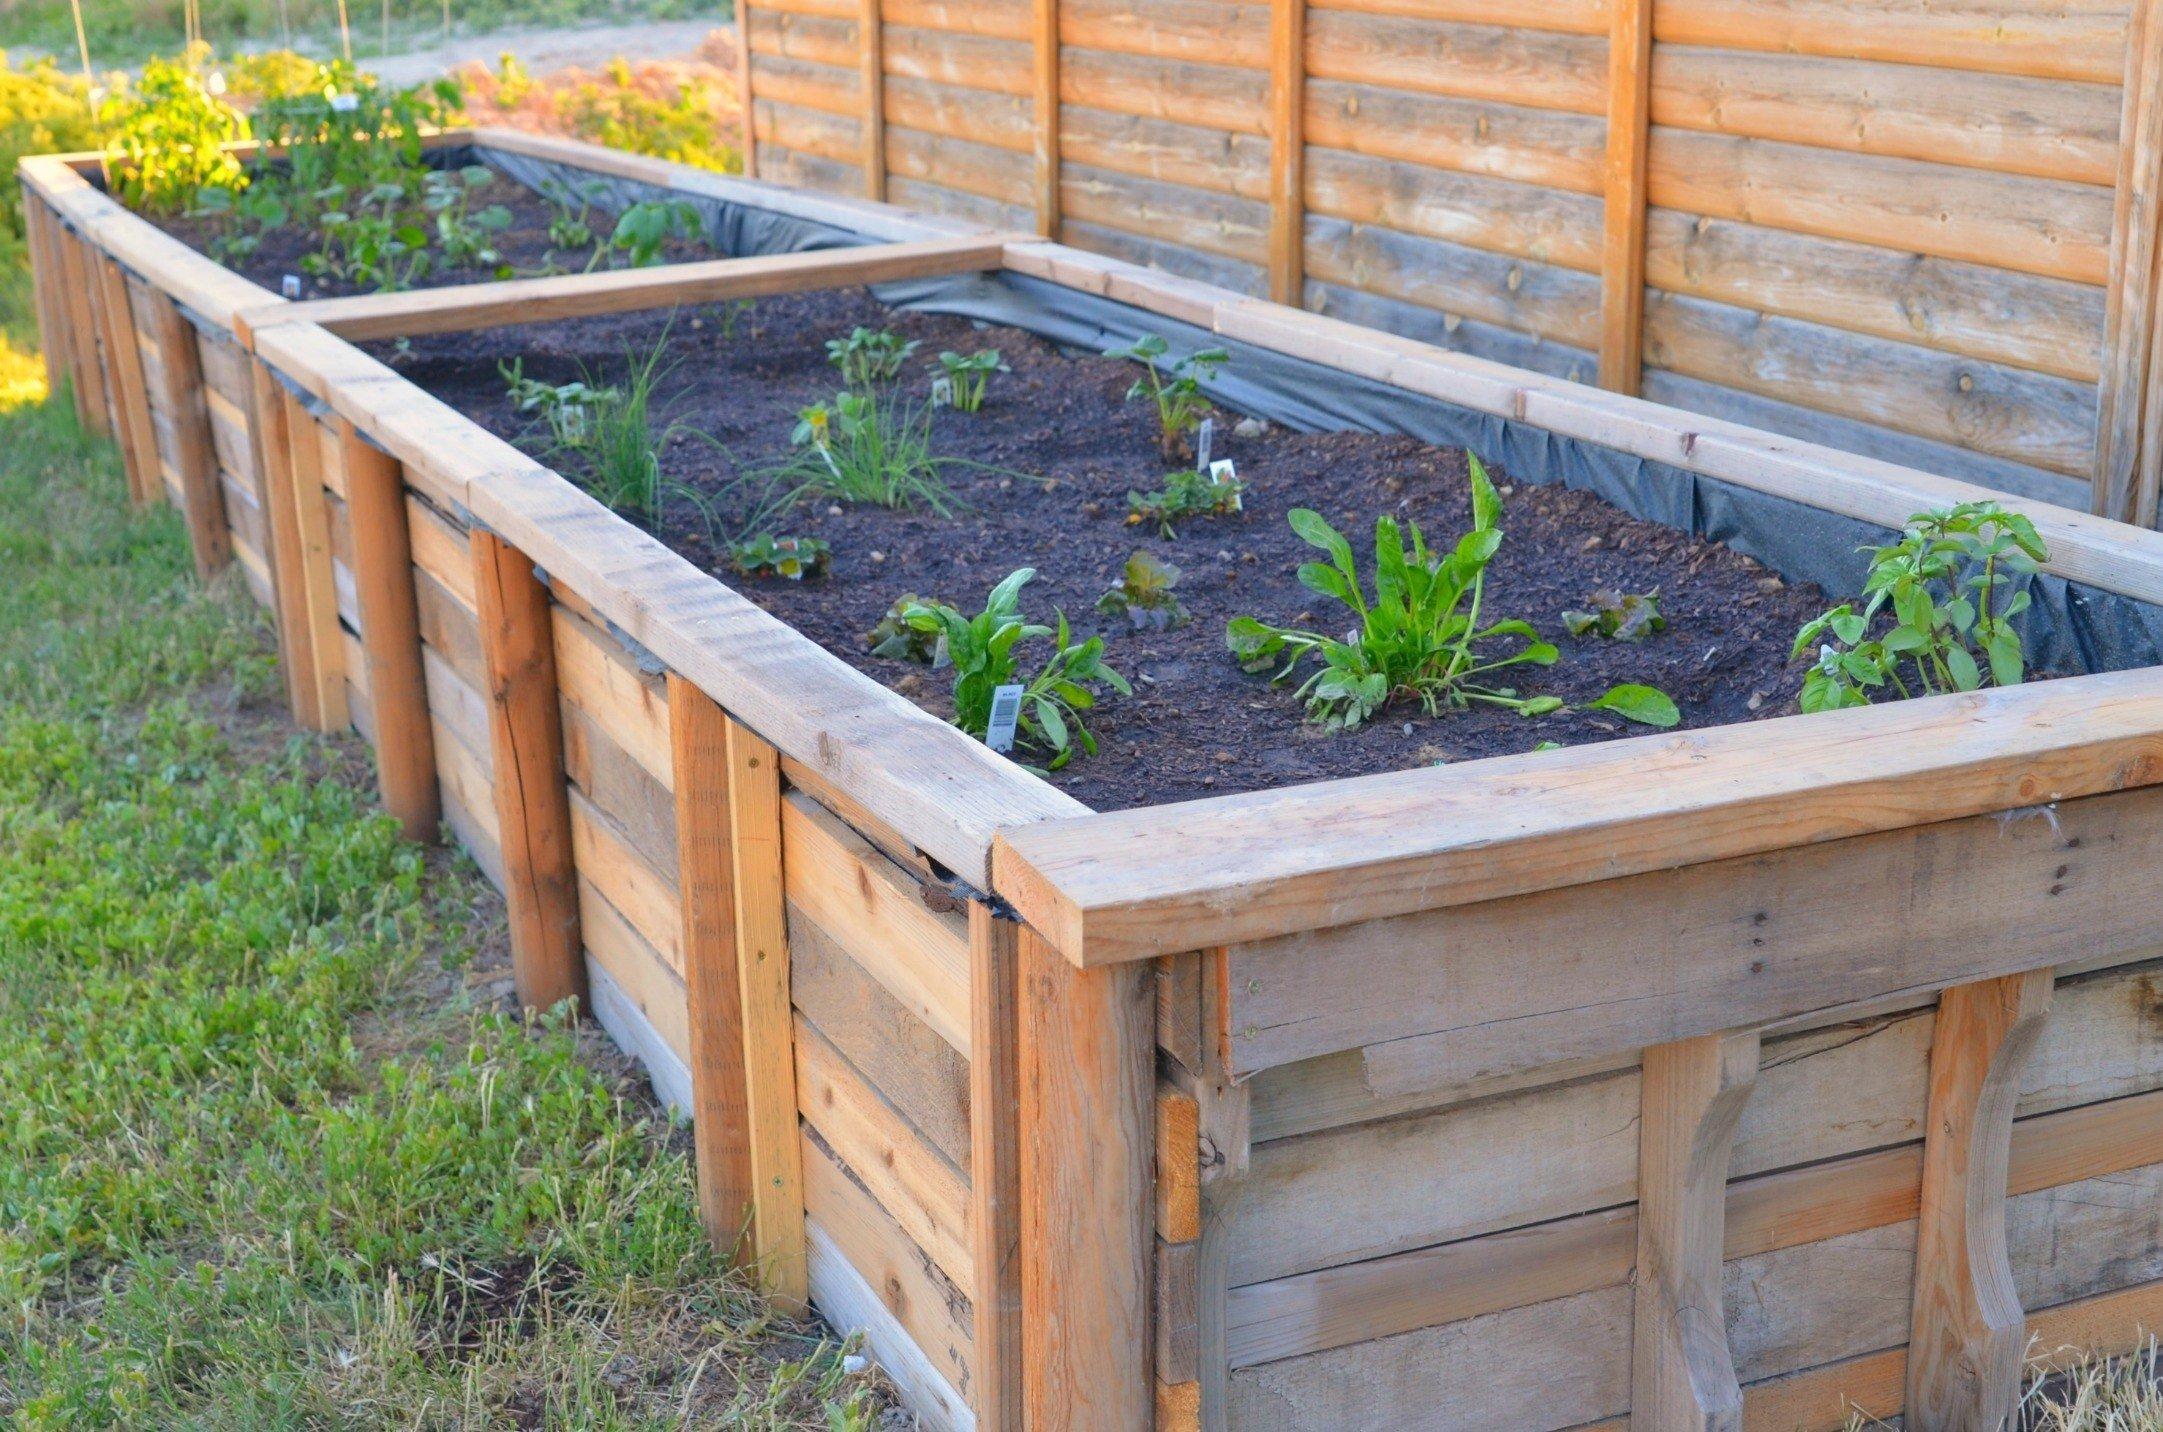 10 Unique Raised Bed Garden Design Ideas raised garden bed frame ideas incredible diy raised bed garden box 2021